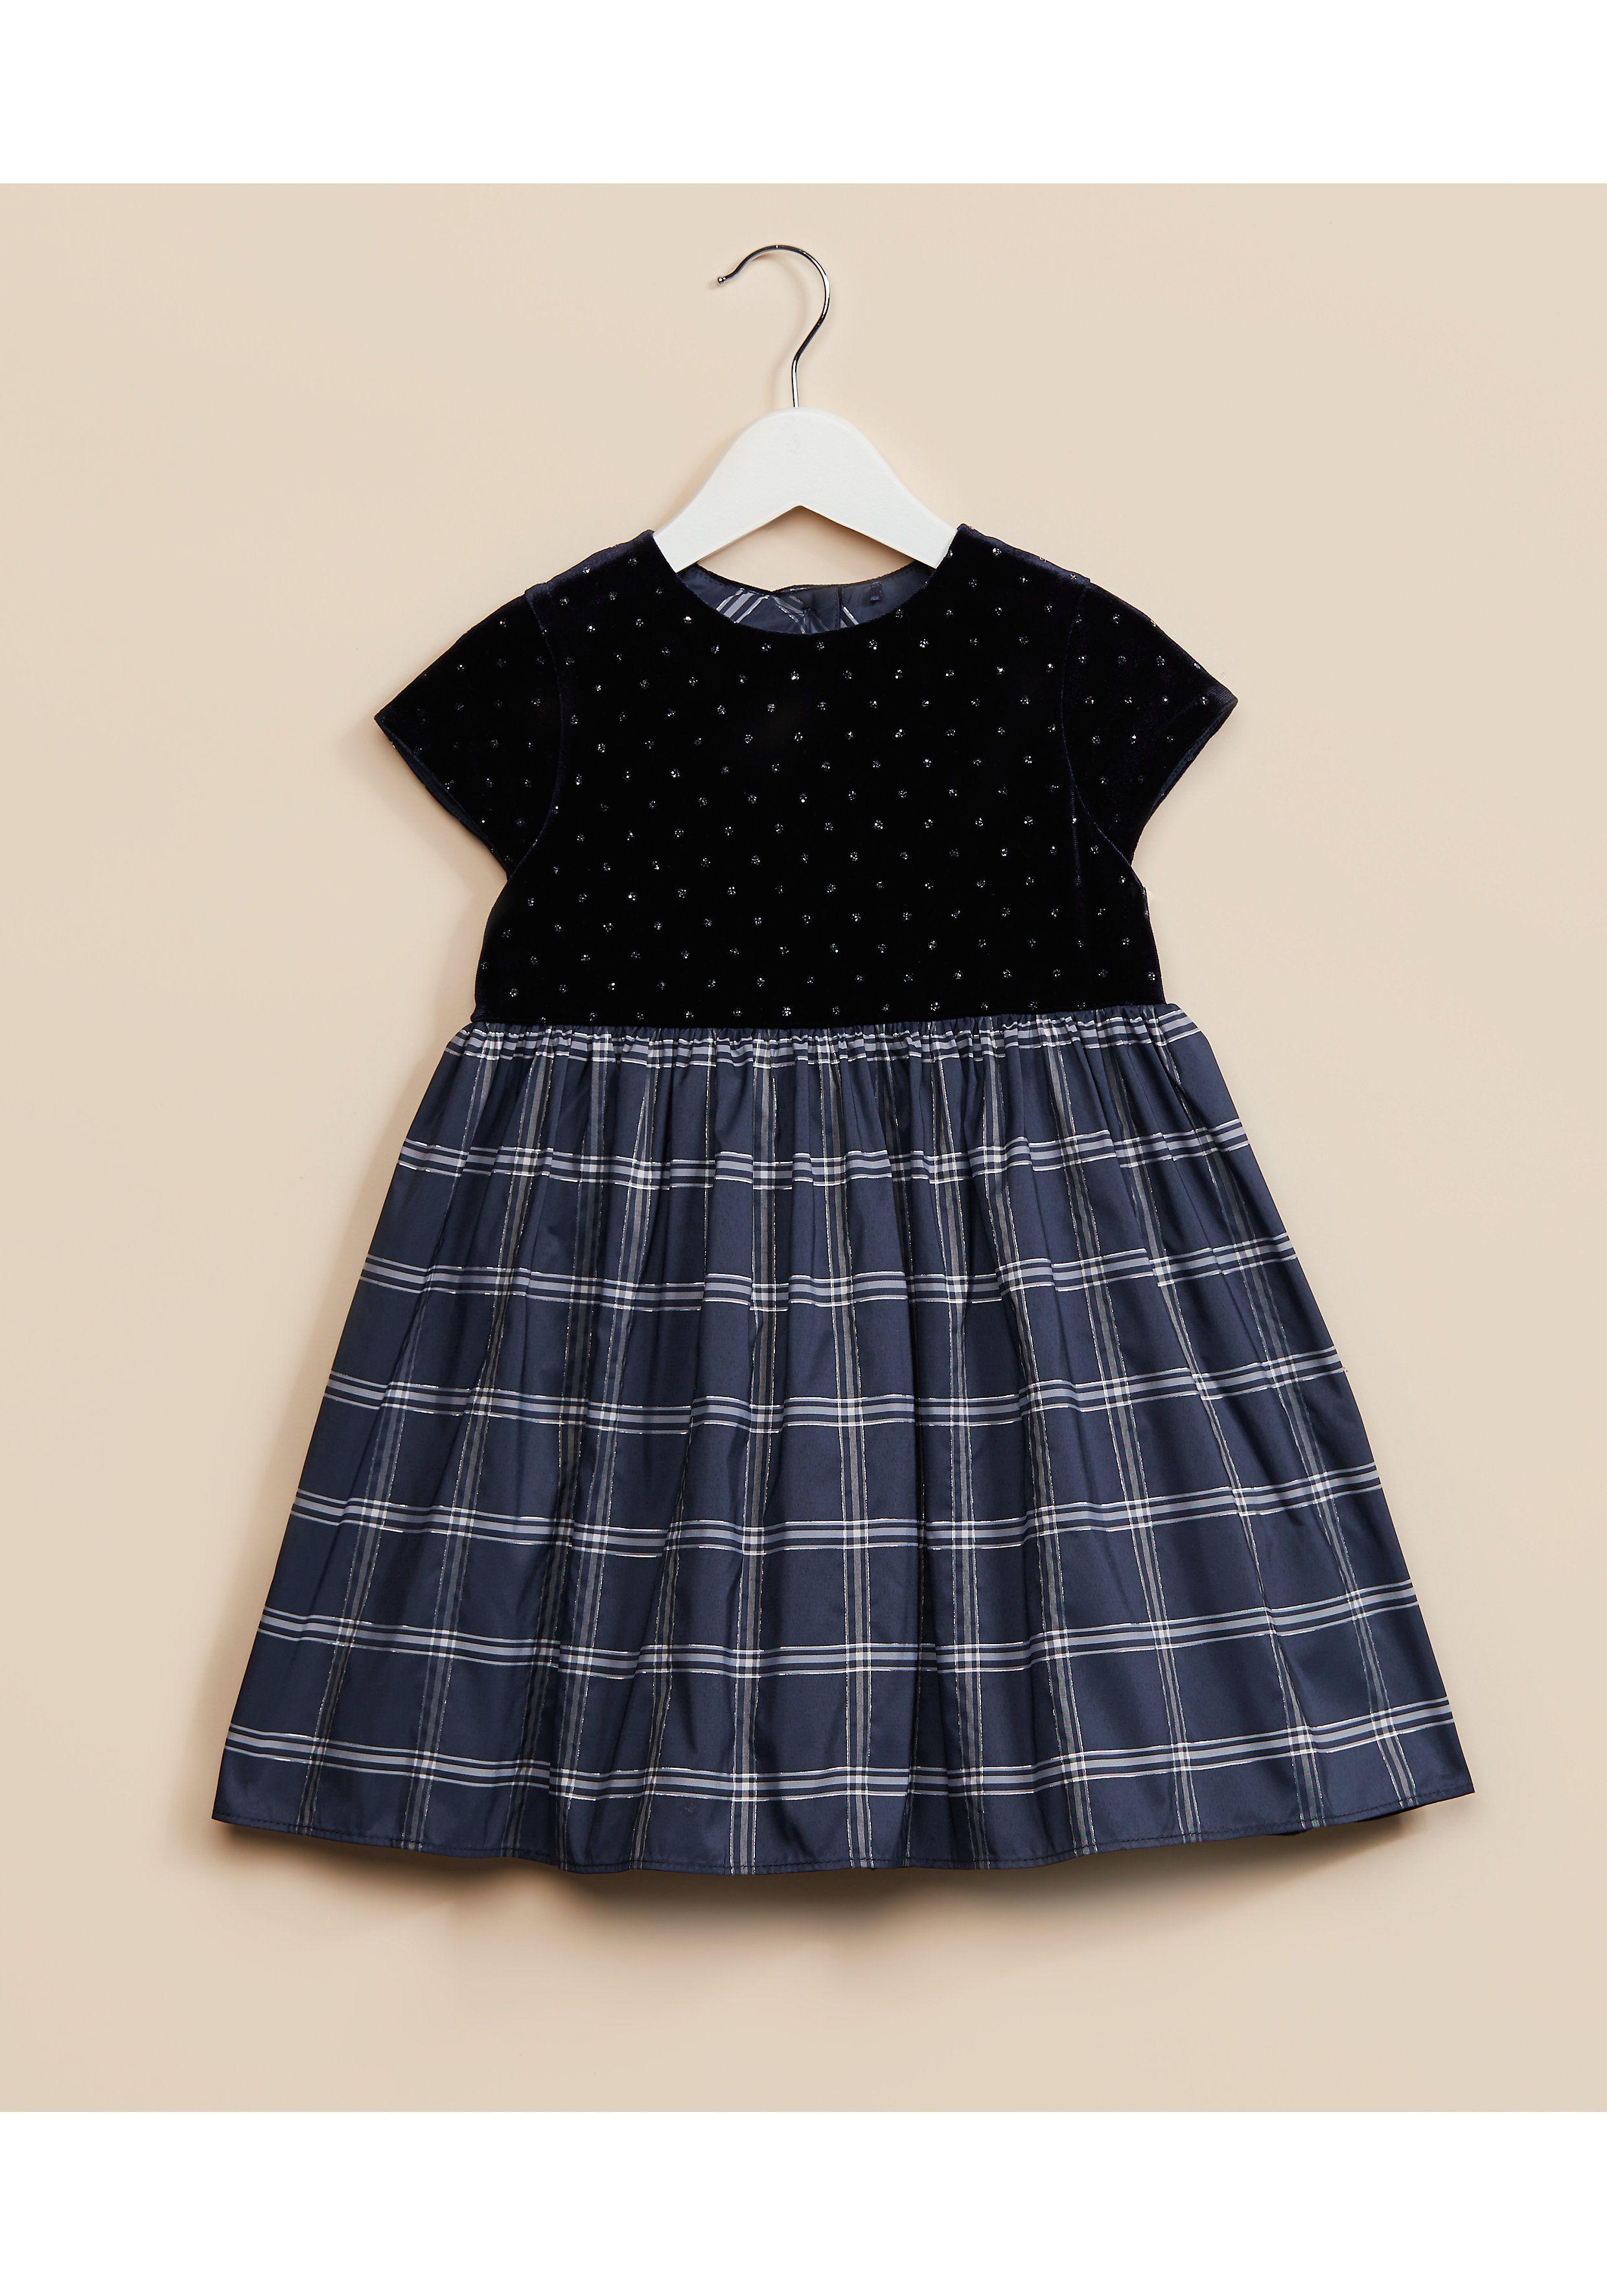 Mothercare | Girls Navy Velour Check Dress - Navy